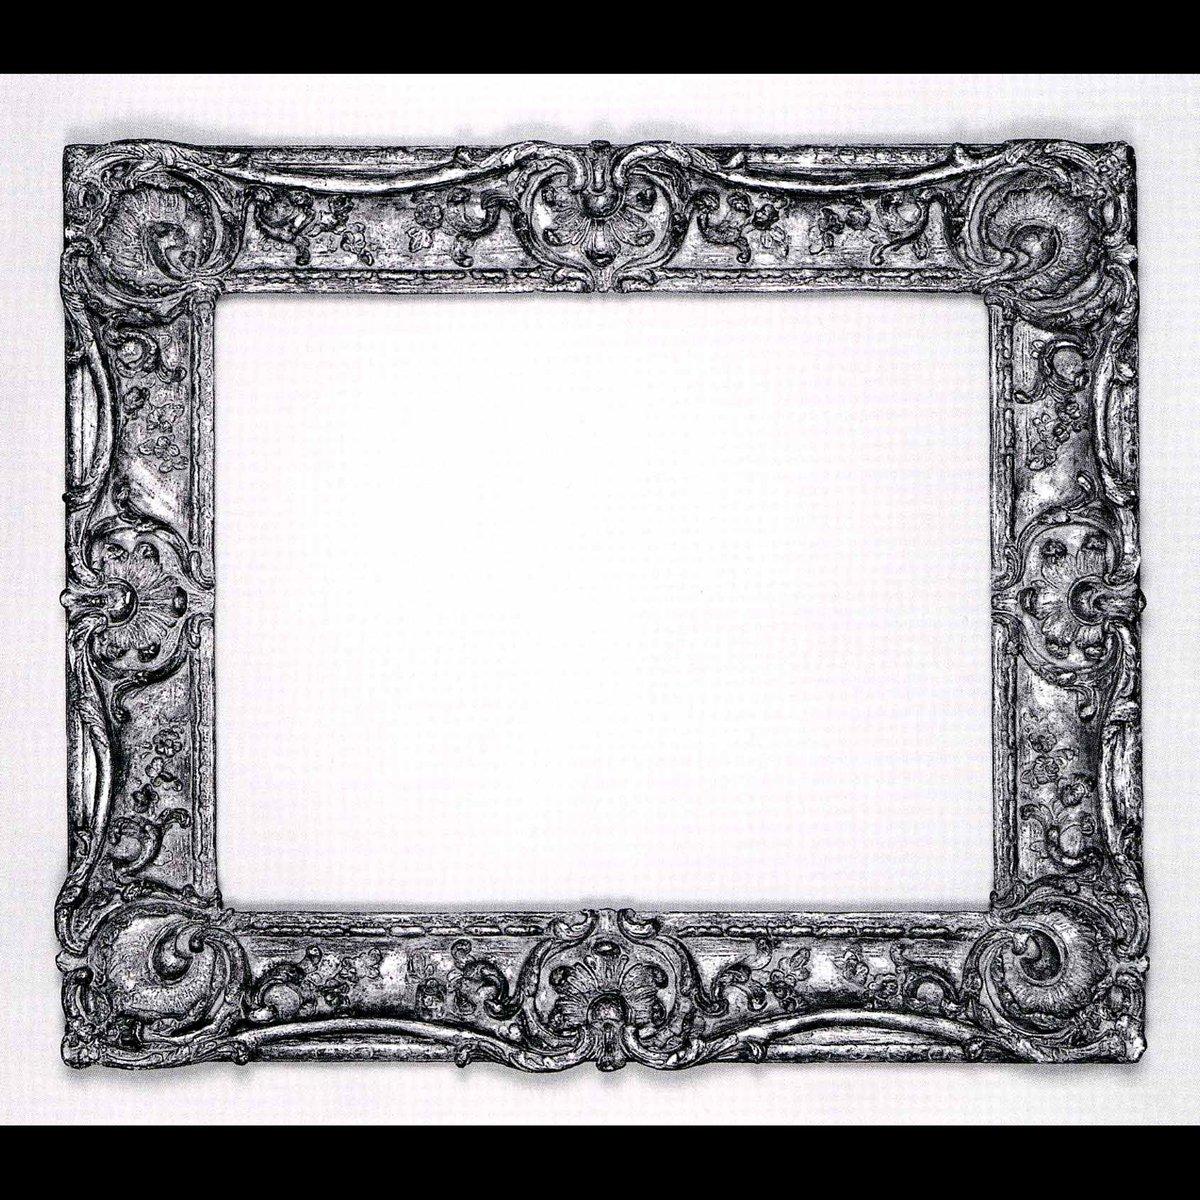 Swept frame Frame  #art #artwork #artlover #artaccount #arte #アート #艺术pic.twitter.com/C6umYWy8IM